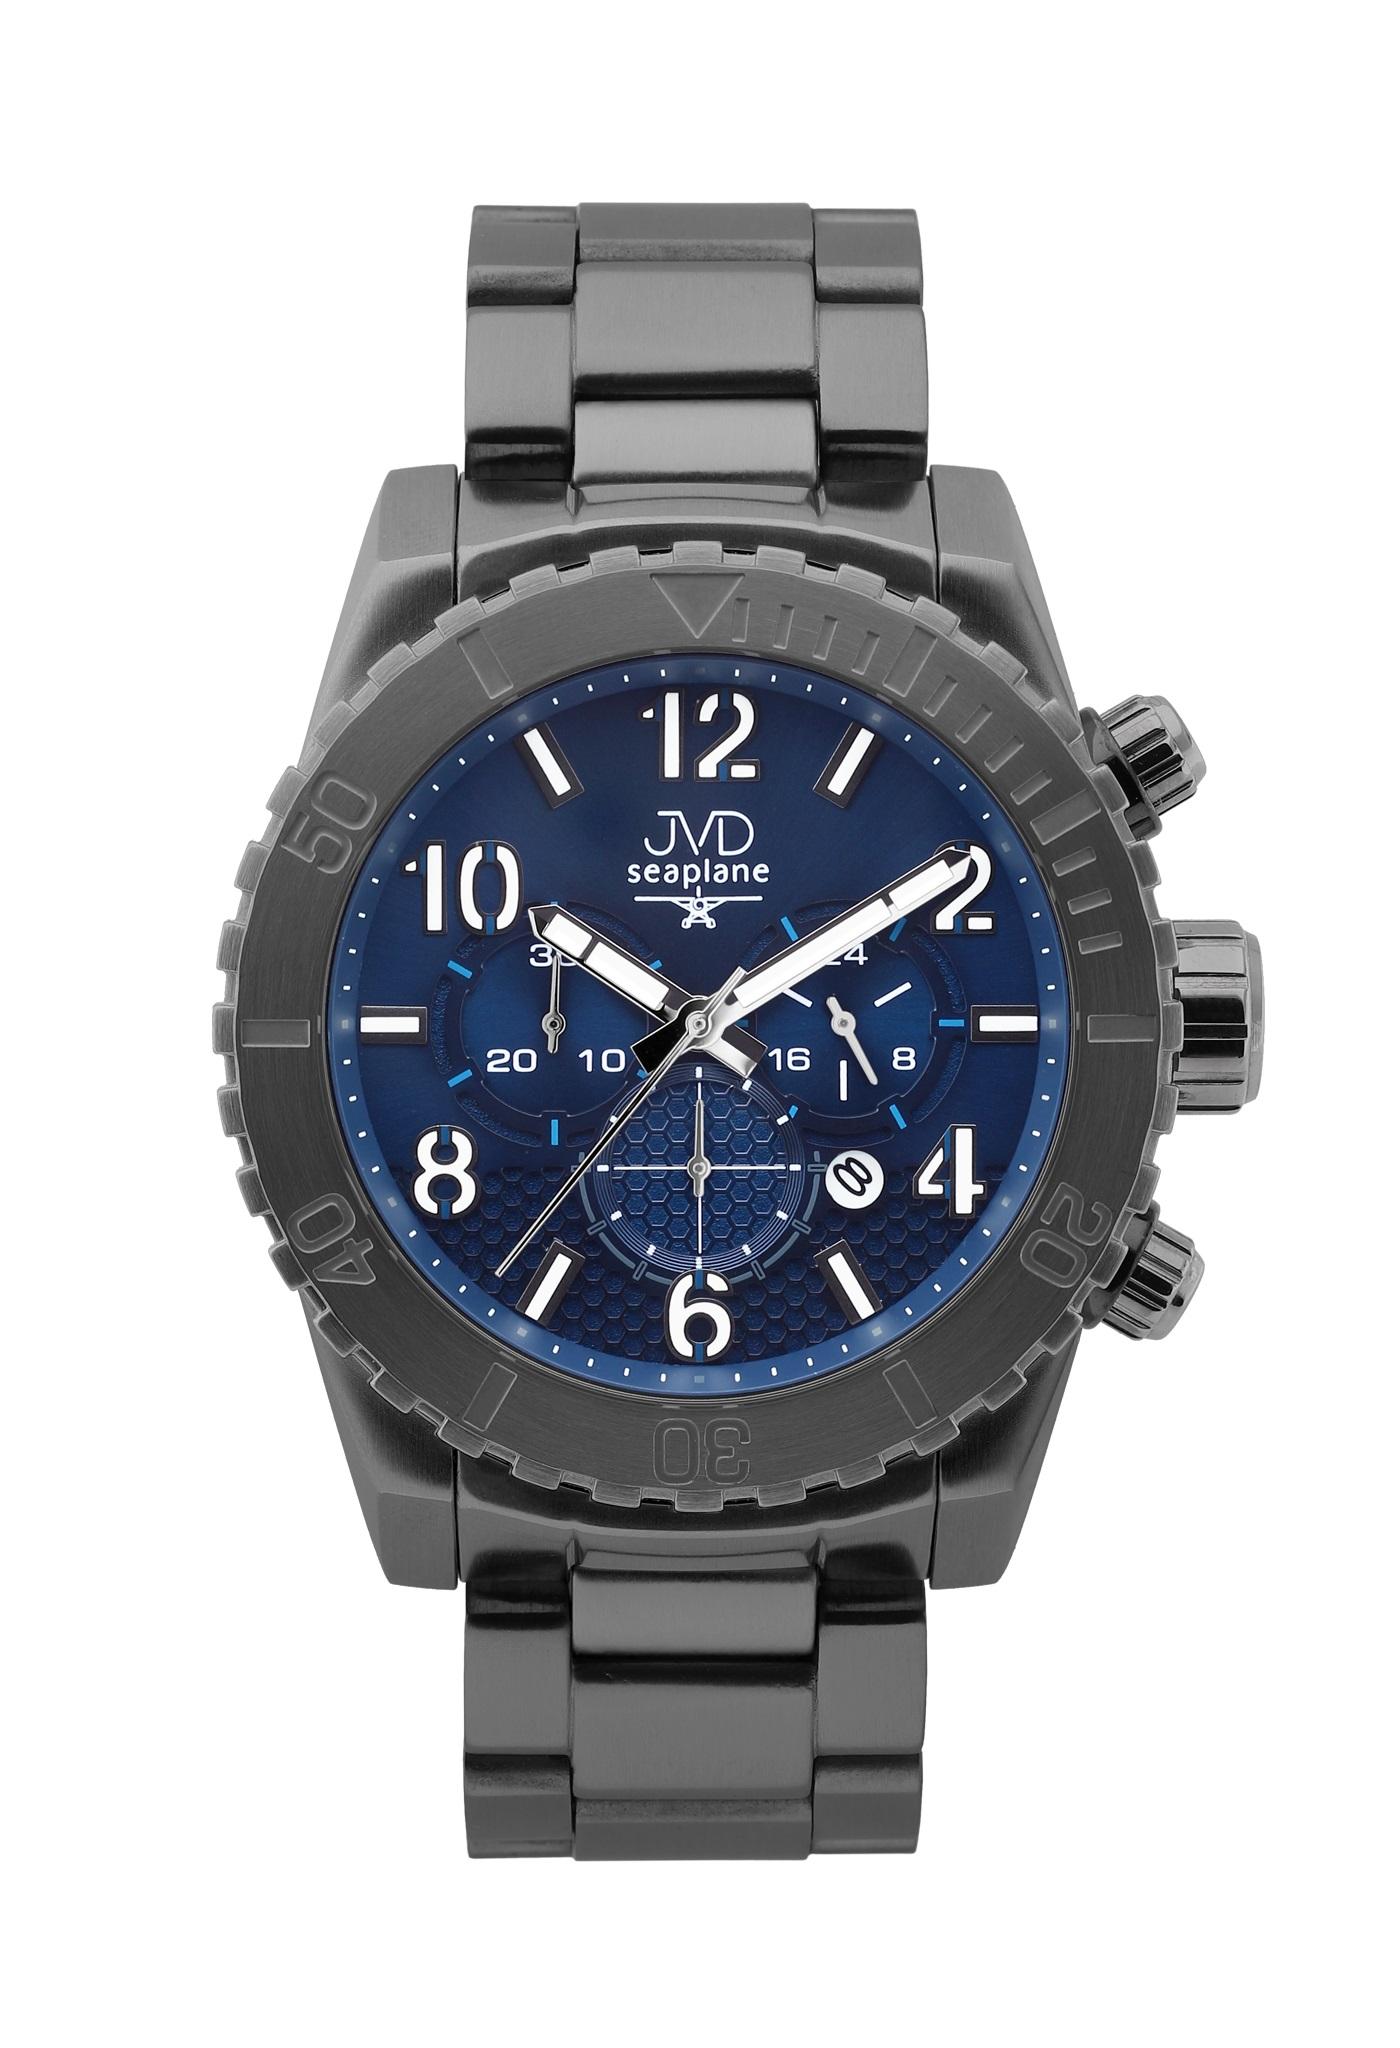 Vodotěsné pánské náramkové hodinky Seaplane METEOR JC703.1 (POŠTOVNÉ ZDARMA!!)